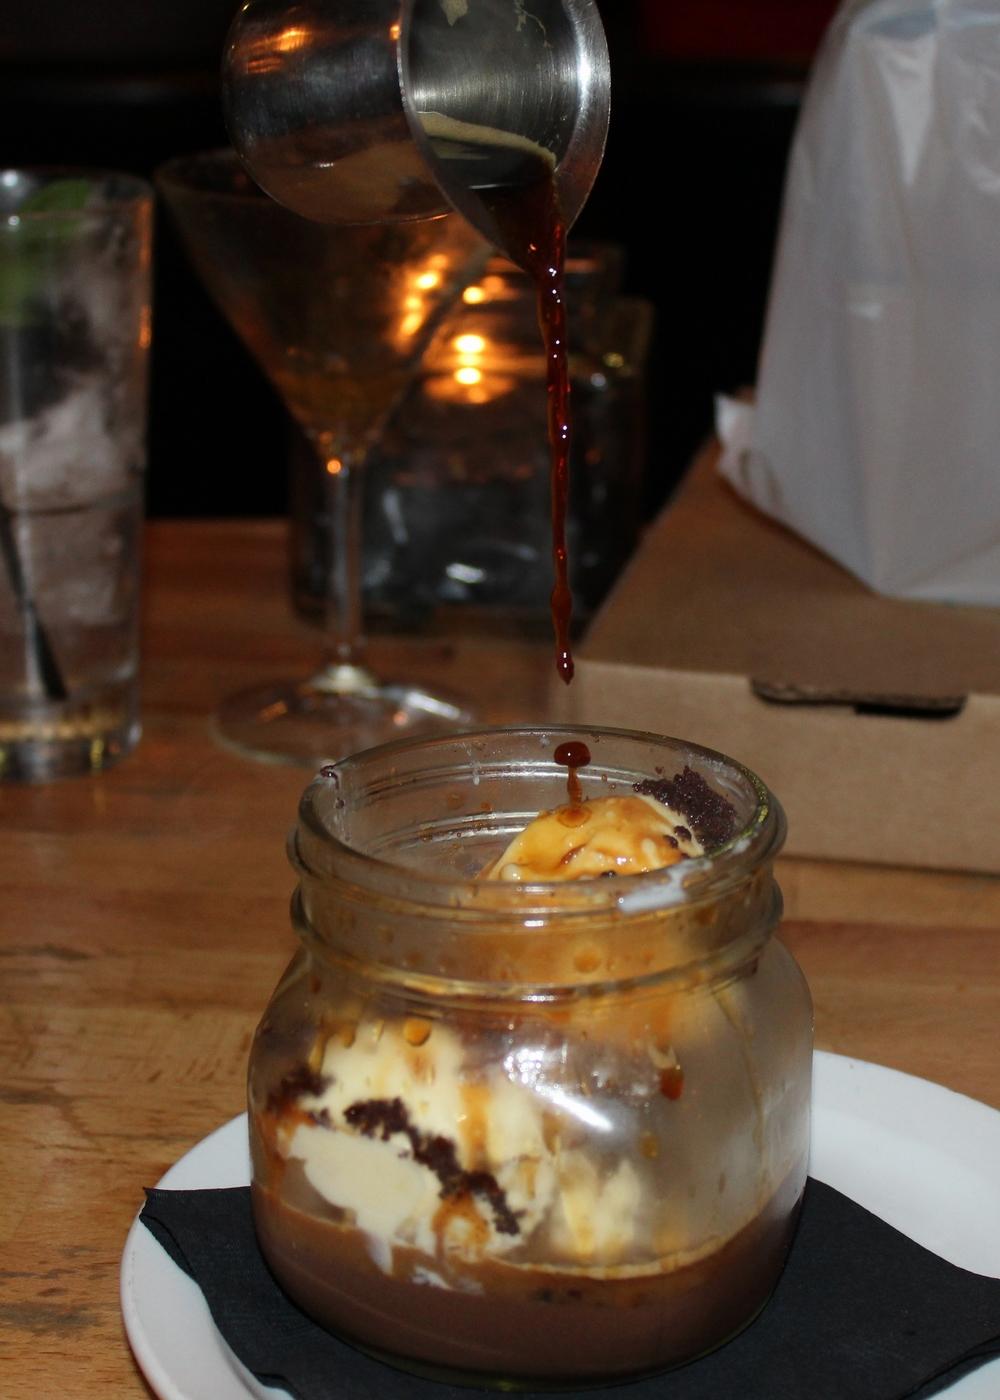 Affogato with chocolate budino, lemon ice cream, chocolate crumble, and espresso